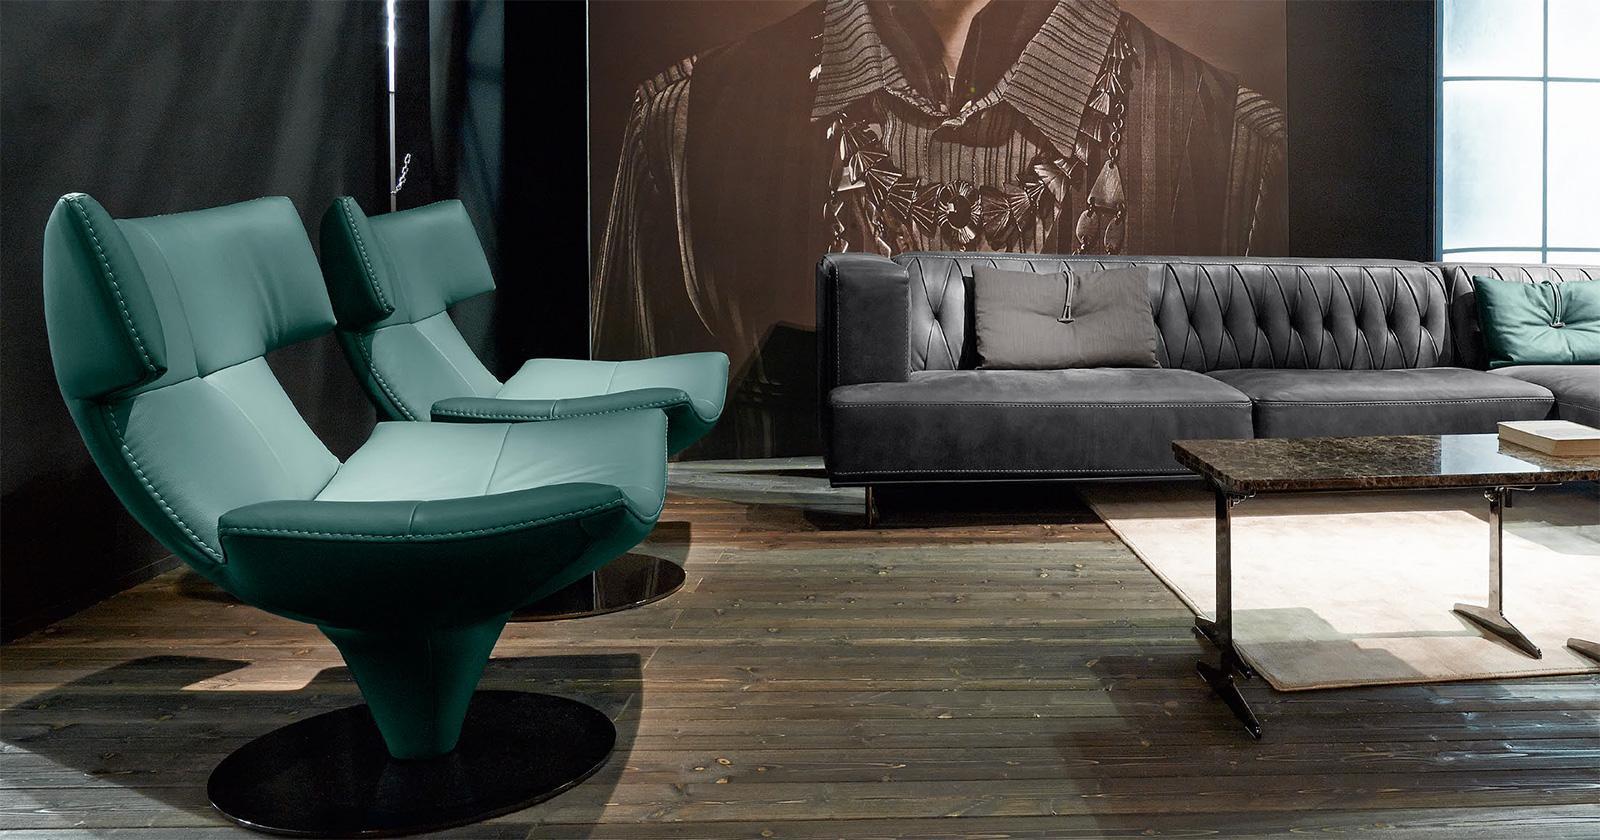 Modern swivel armchair - Armchair Back Support Ergonomics High Back Headrest Leather Modern Online Swivel Stores Shops Design Sale Italia